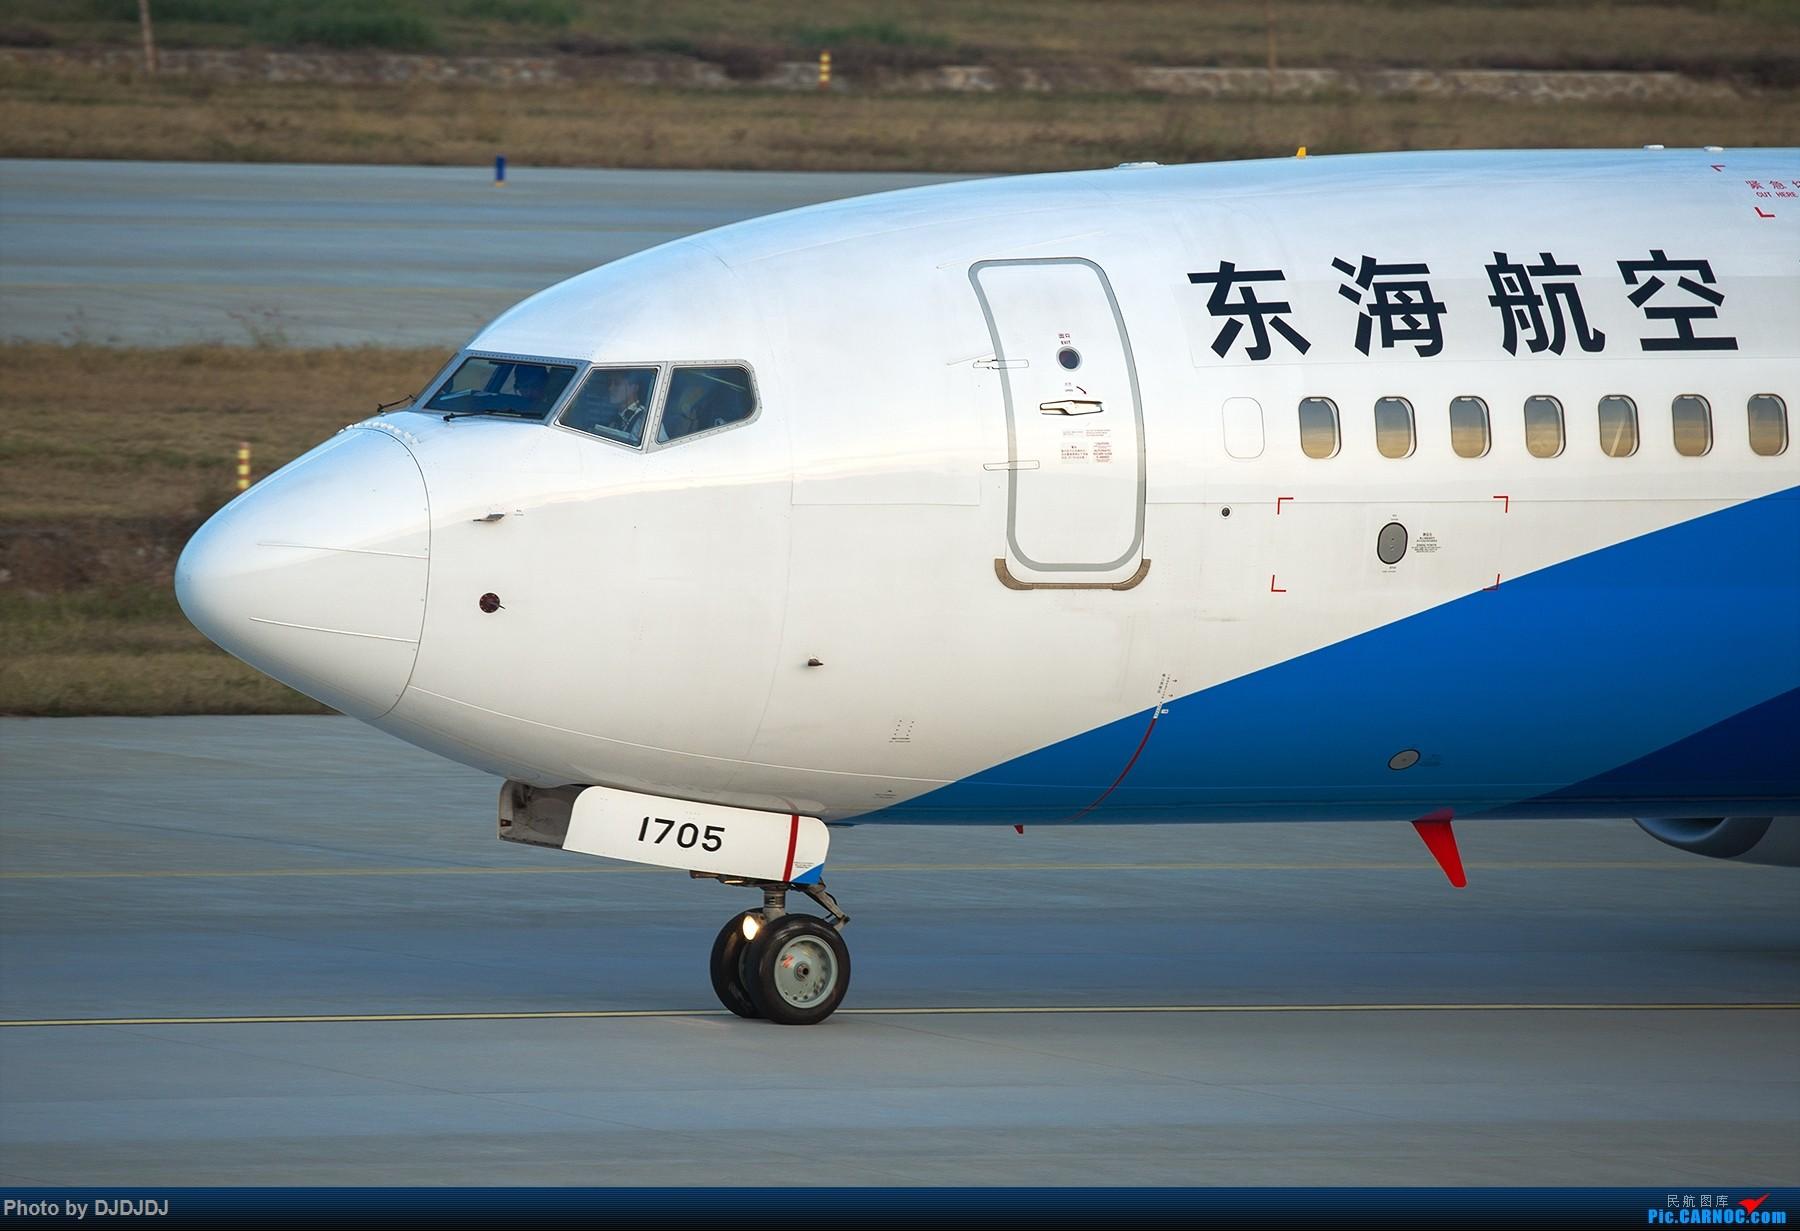 Re:[原创]【BLDDQ】夕阳大头 BOEING 737-800 B-1705 中国深圳宝安国际机场